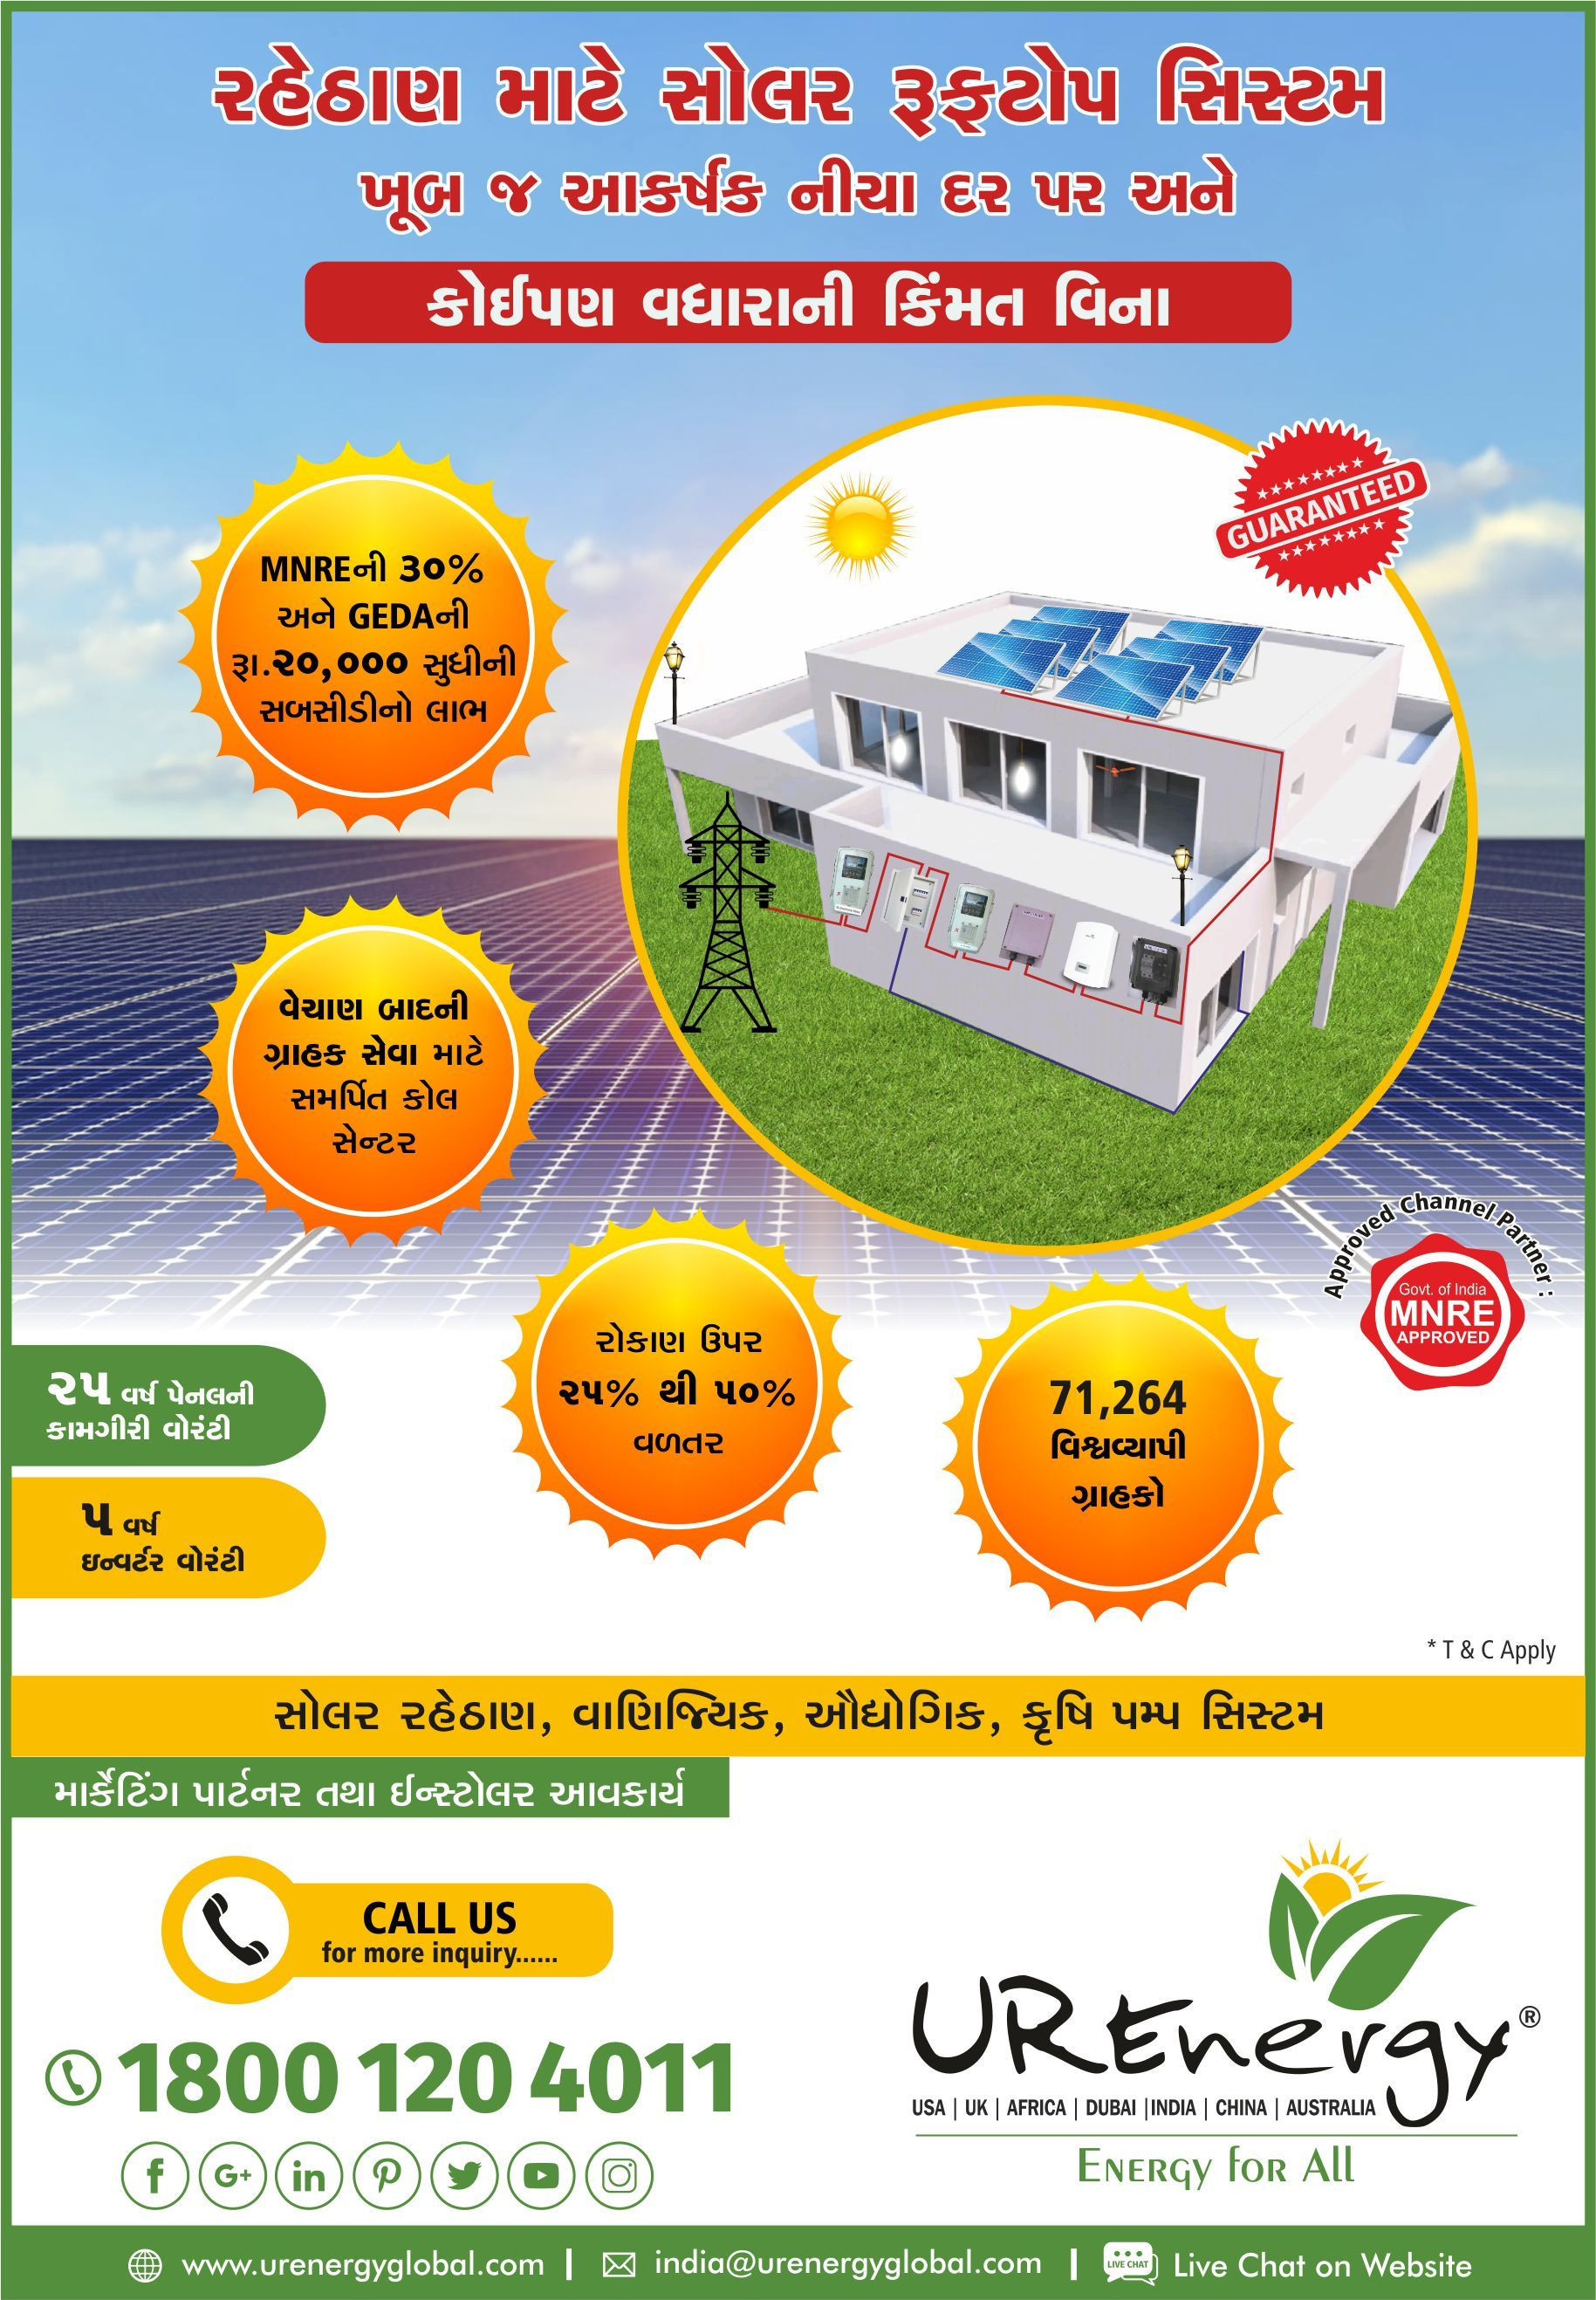 Rooftop Solar Panel Inverters Water Pump Solar Epc Gujarat India U R Energy Solar Water Pump Renewable Energy Companies Solar